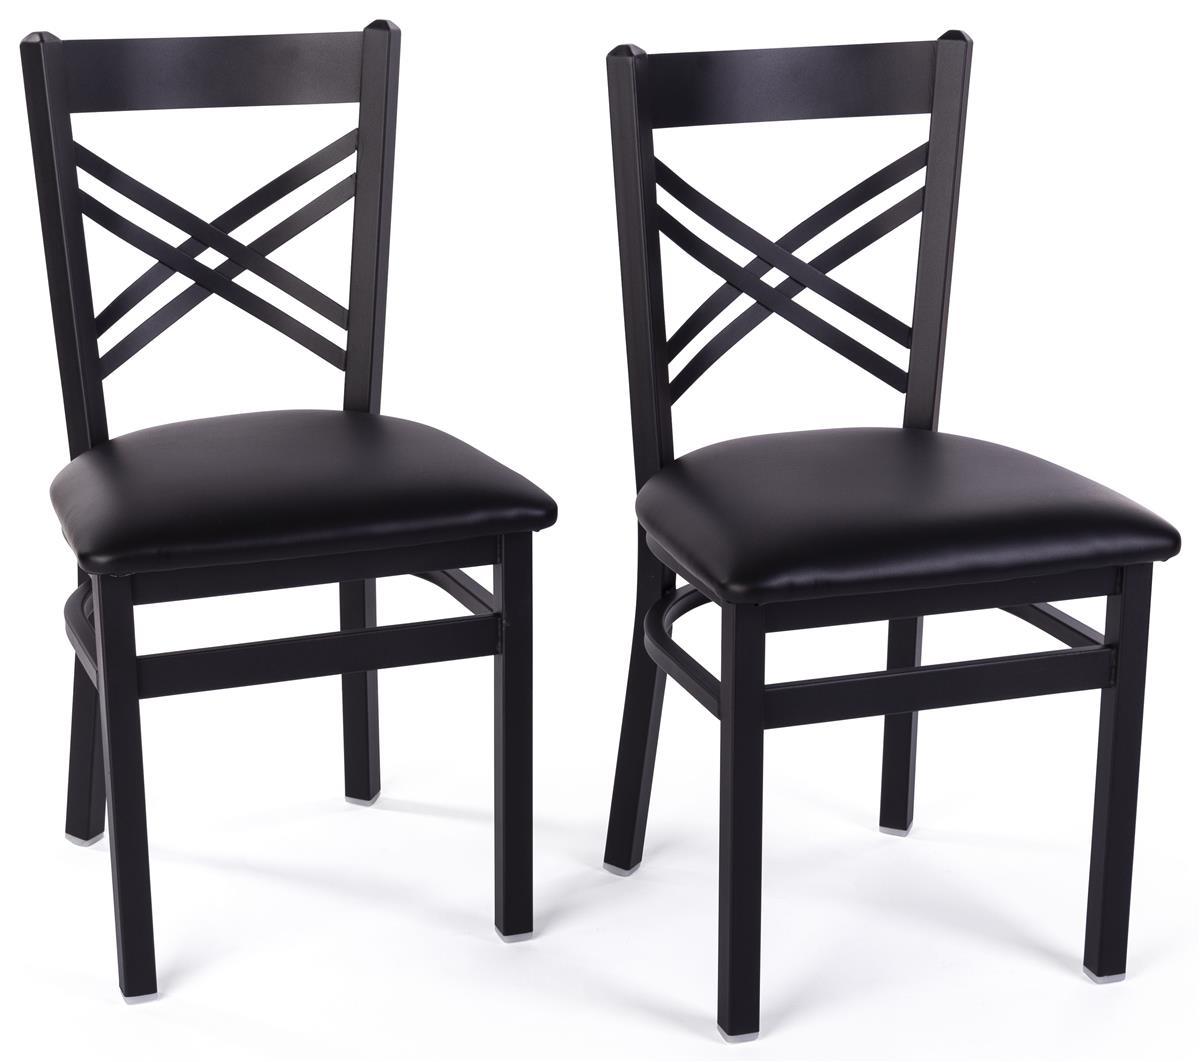 "8"" Café Style Chair, Cross Back, Black Epoxy Coat Finish, Set of 8 - Black"